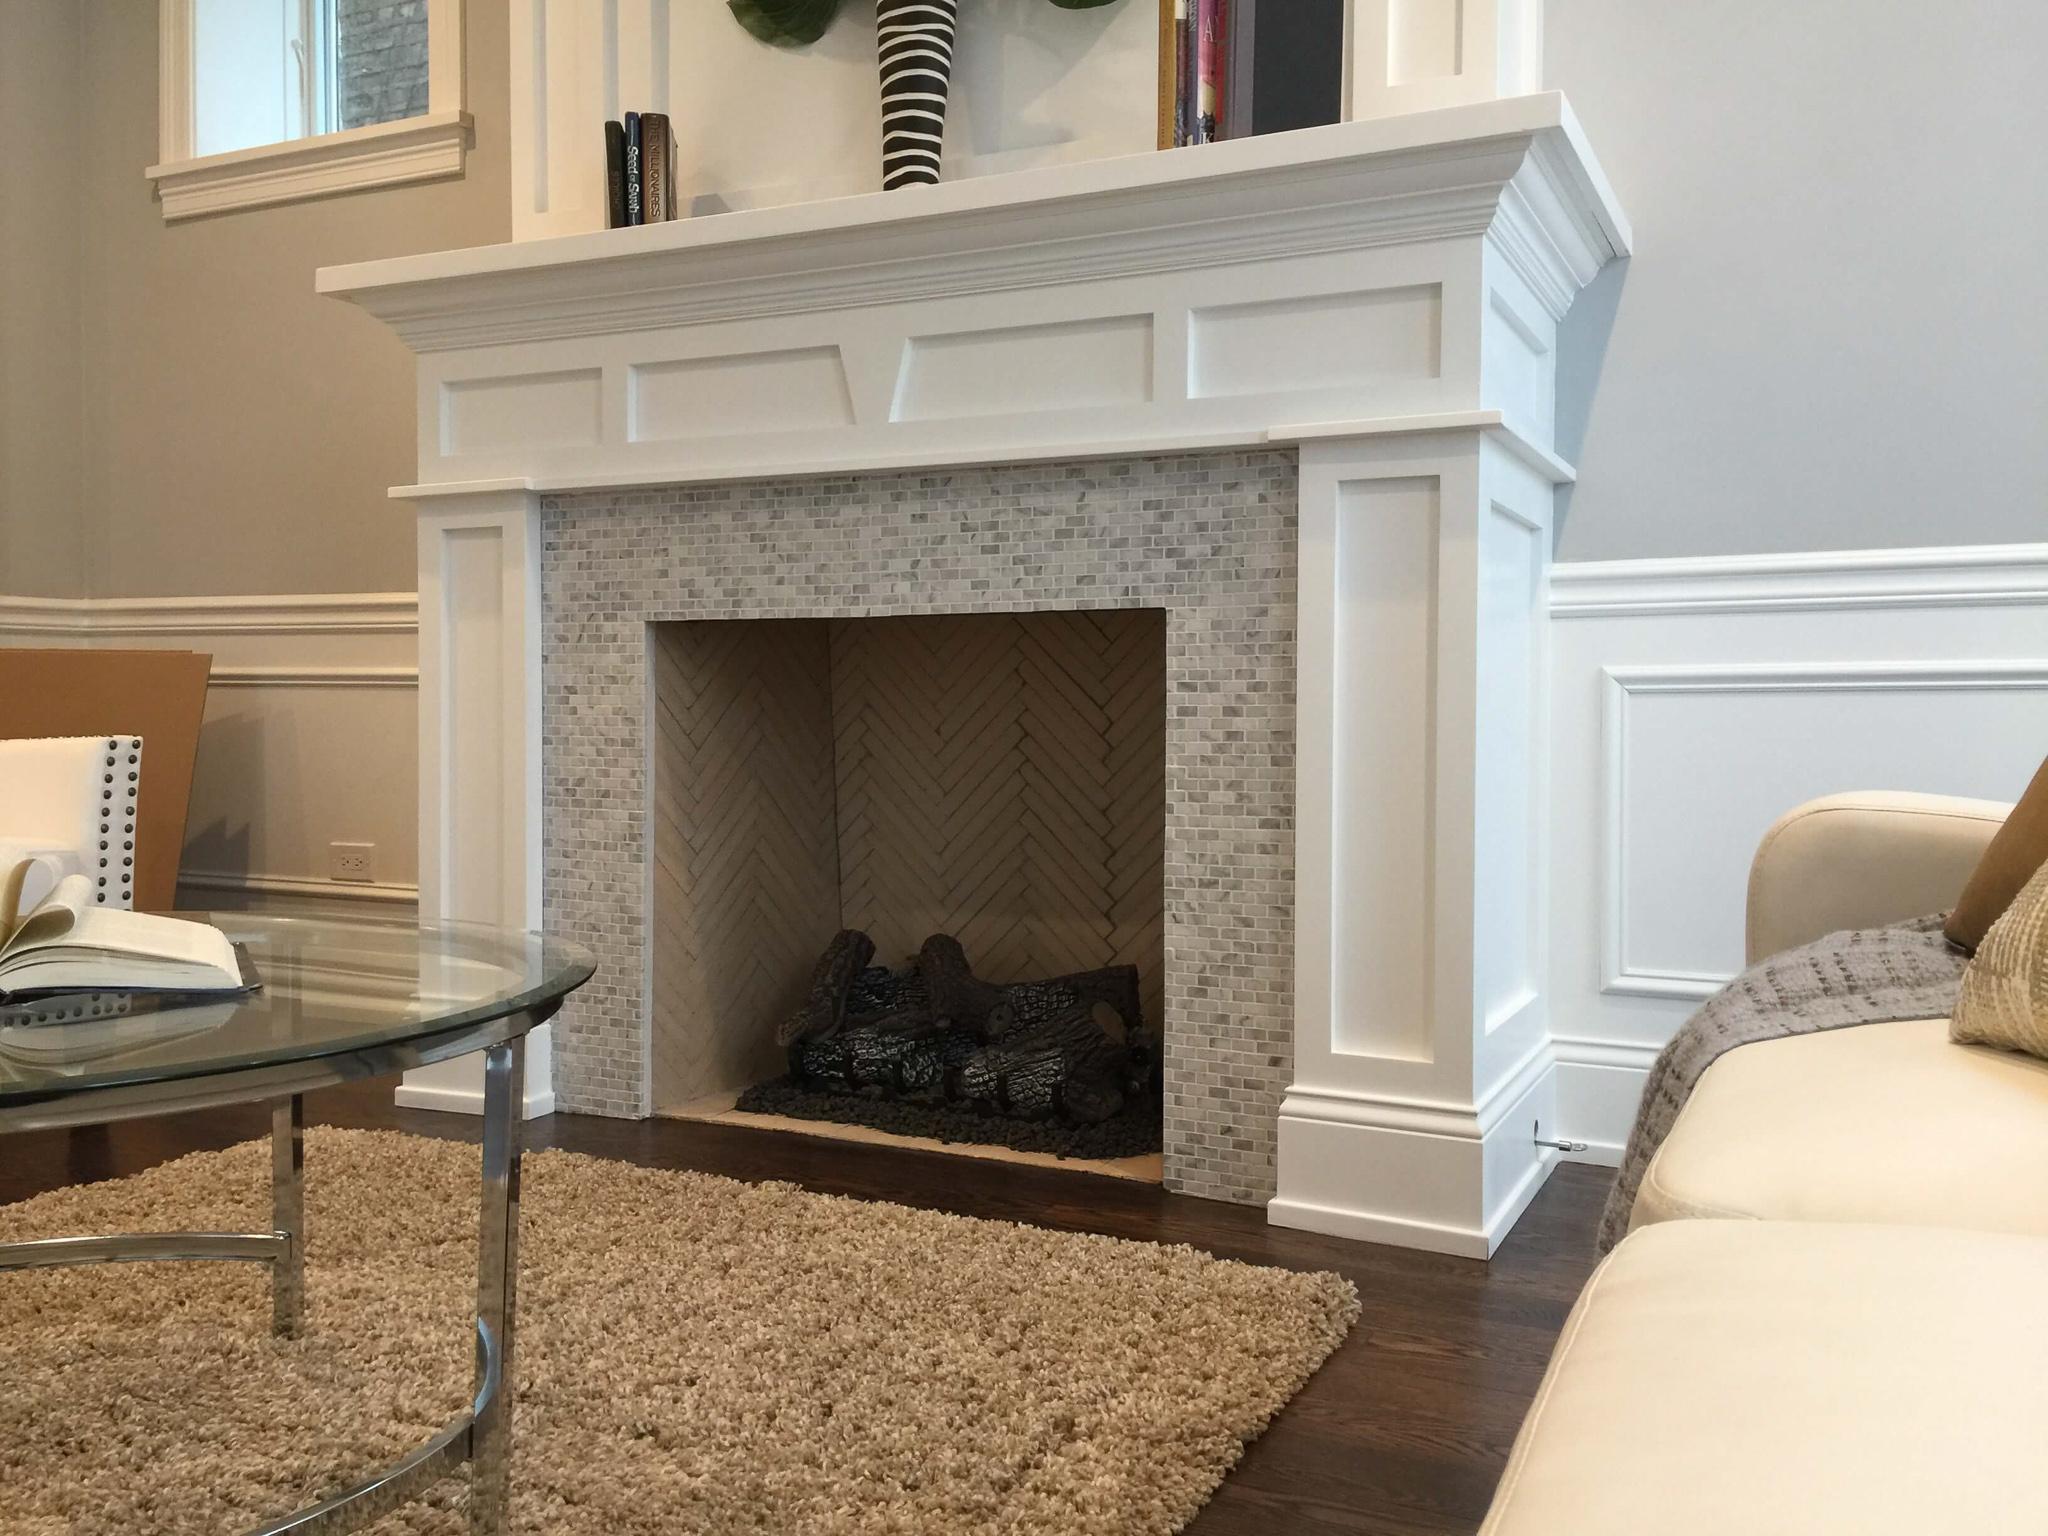 Fireplace (Mosaic Tile Surround, Brick Herringbone Firebox)